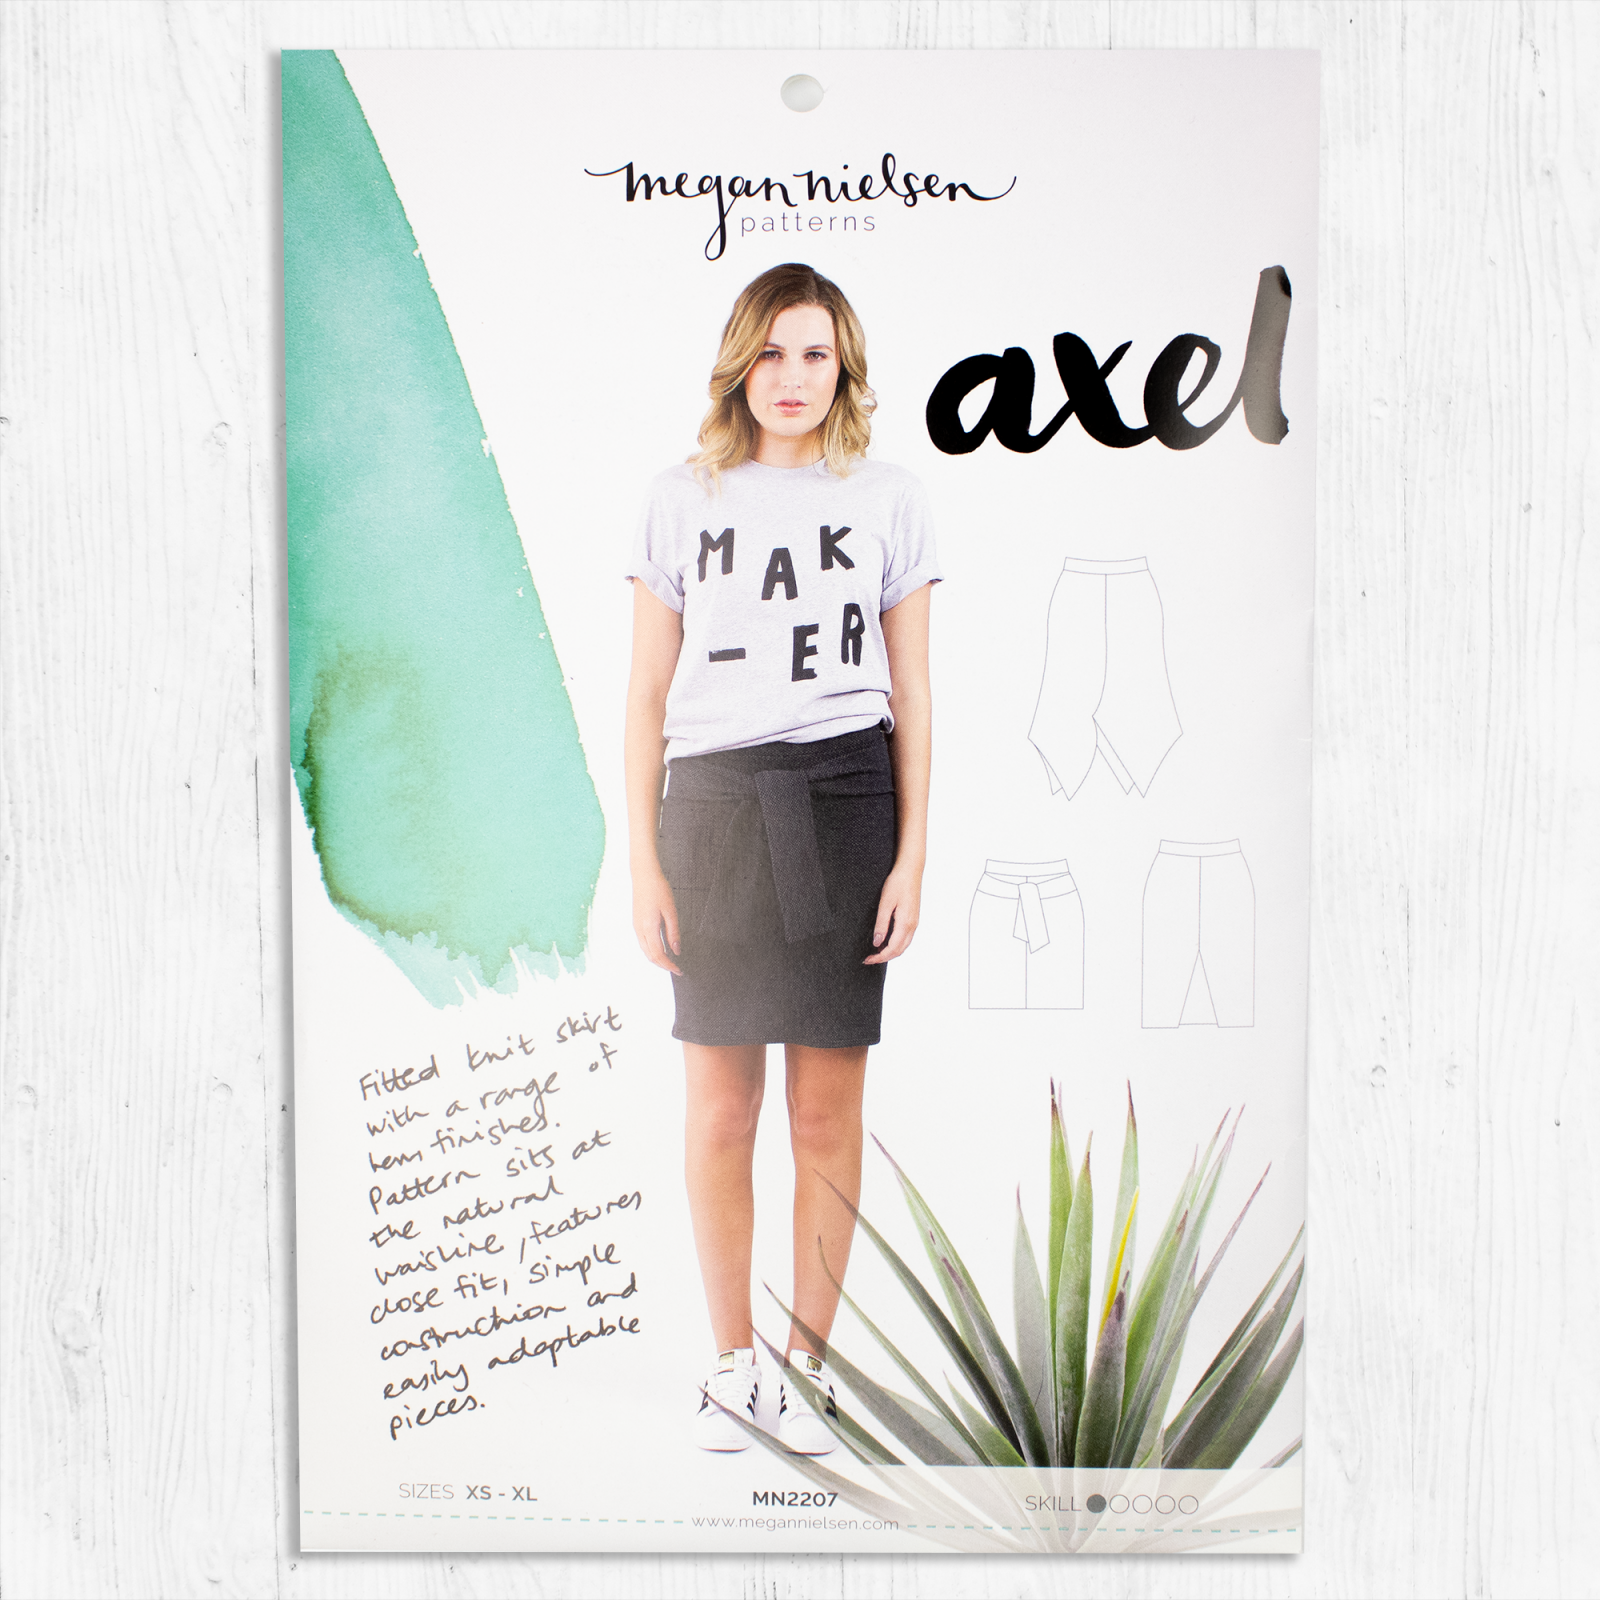 Megan Nielsen Patterns - Axel Skirt